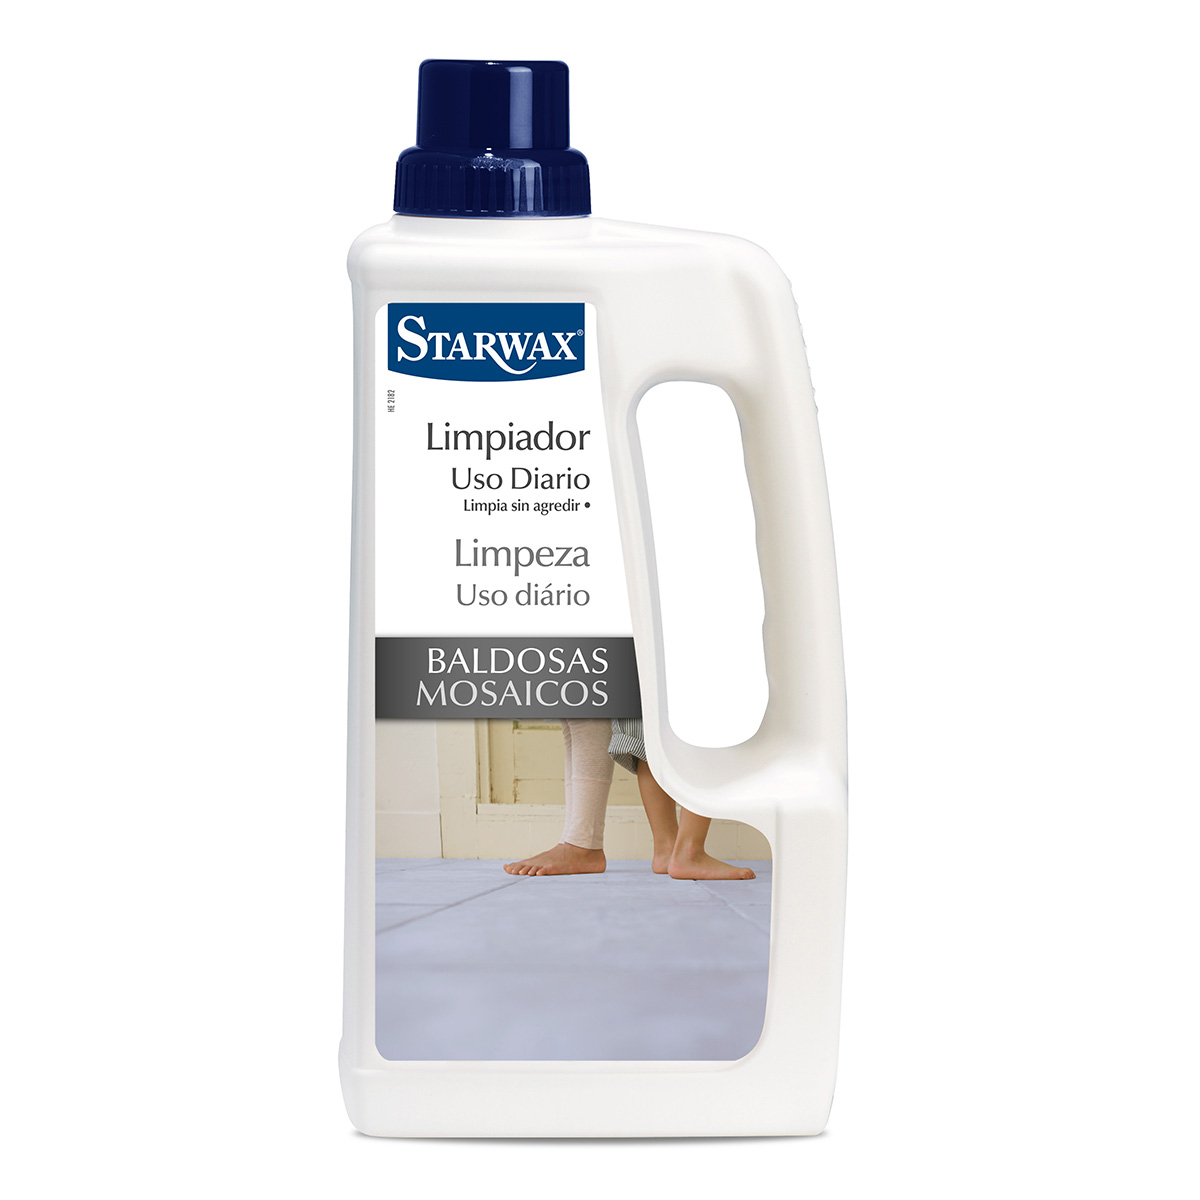 Limpiador uso diario baldosas - Starwax